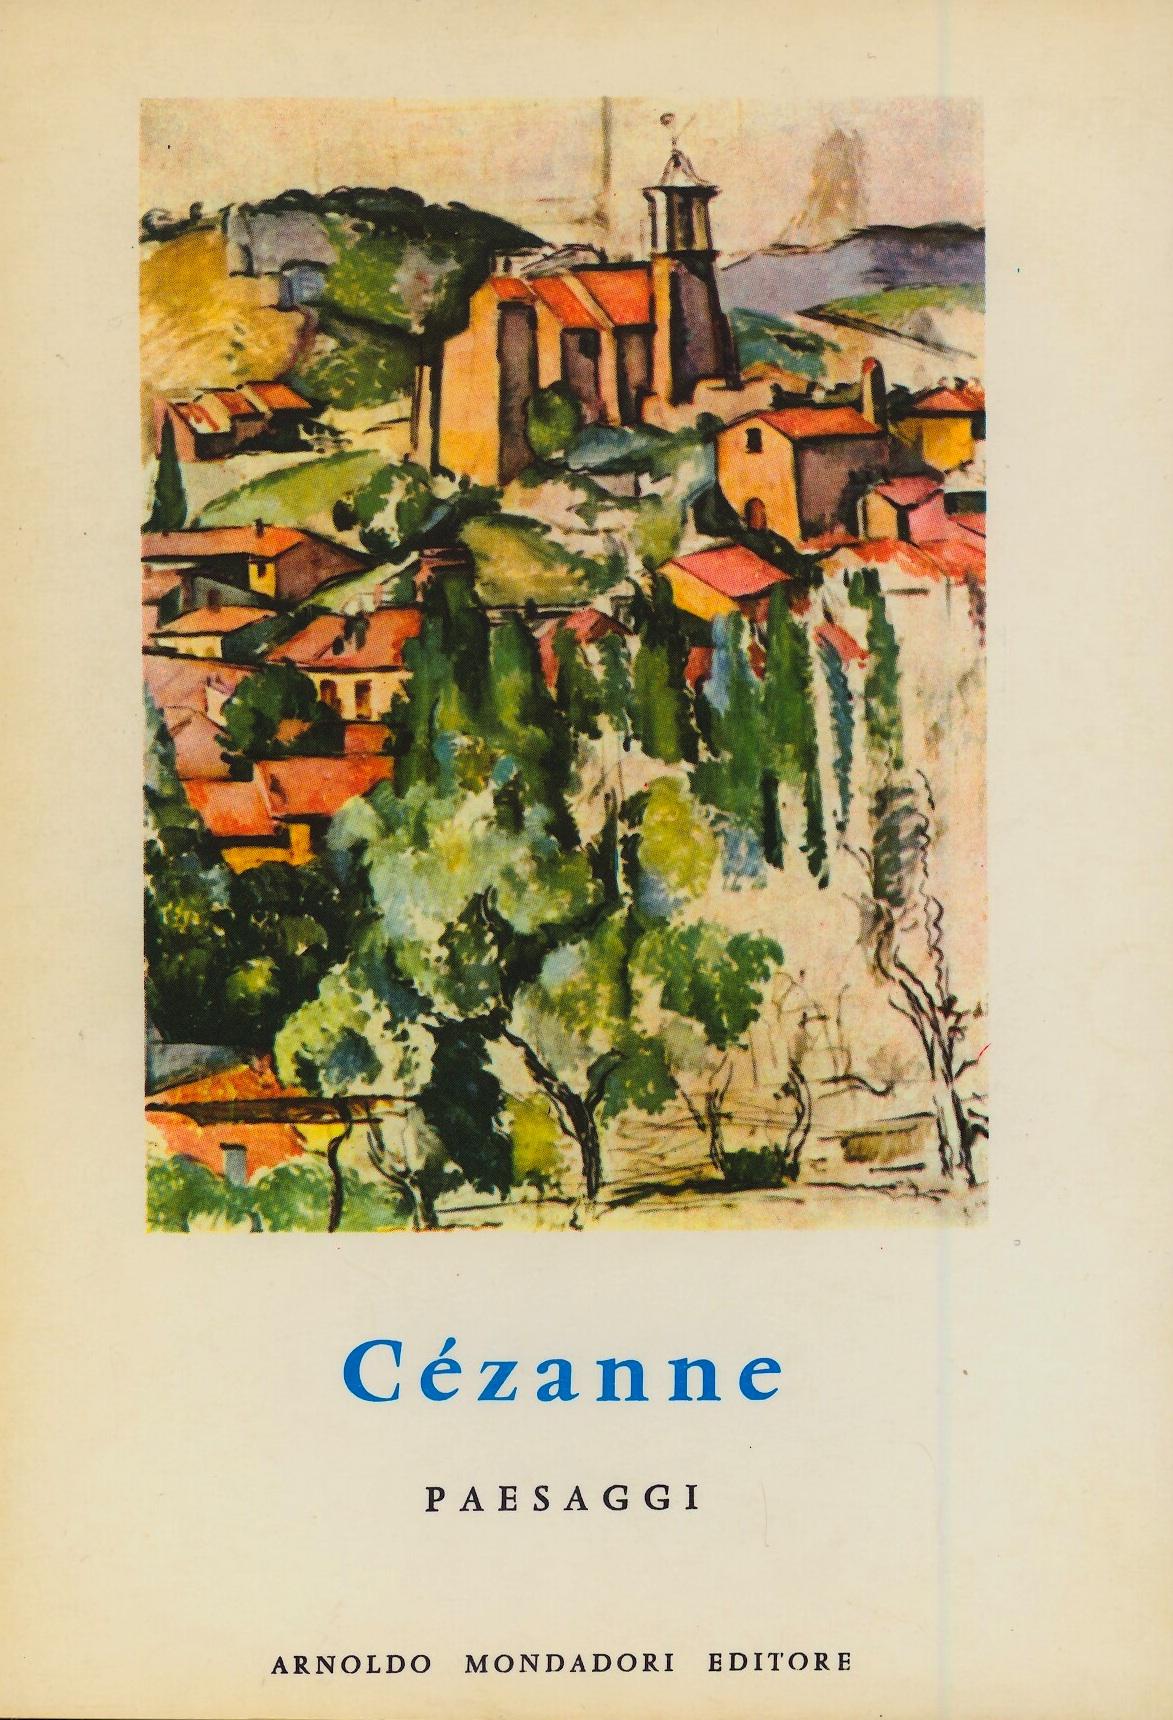 Cézanne: Paesaggi